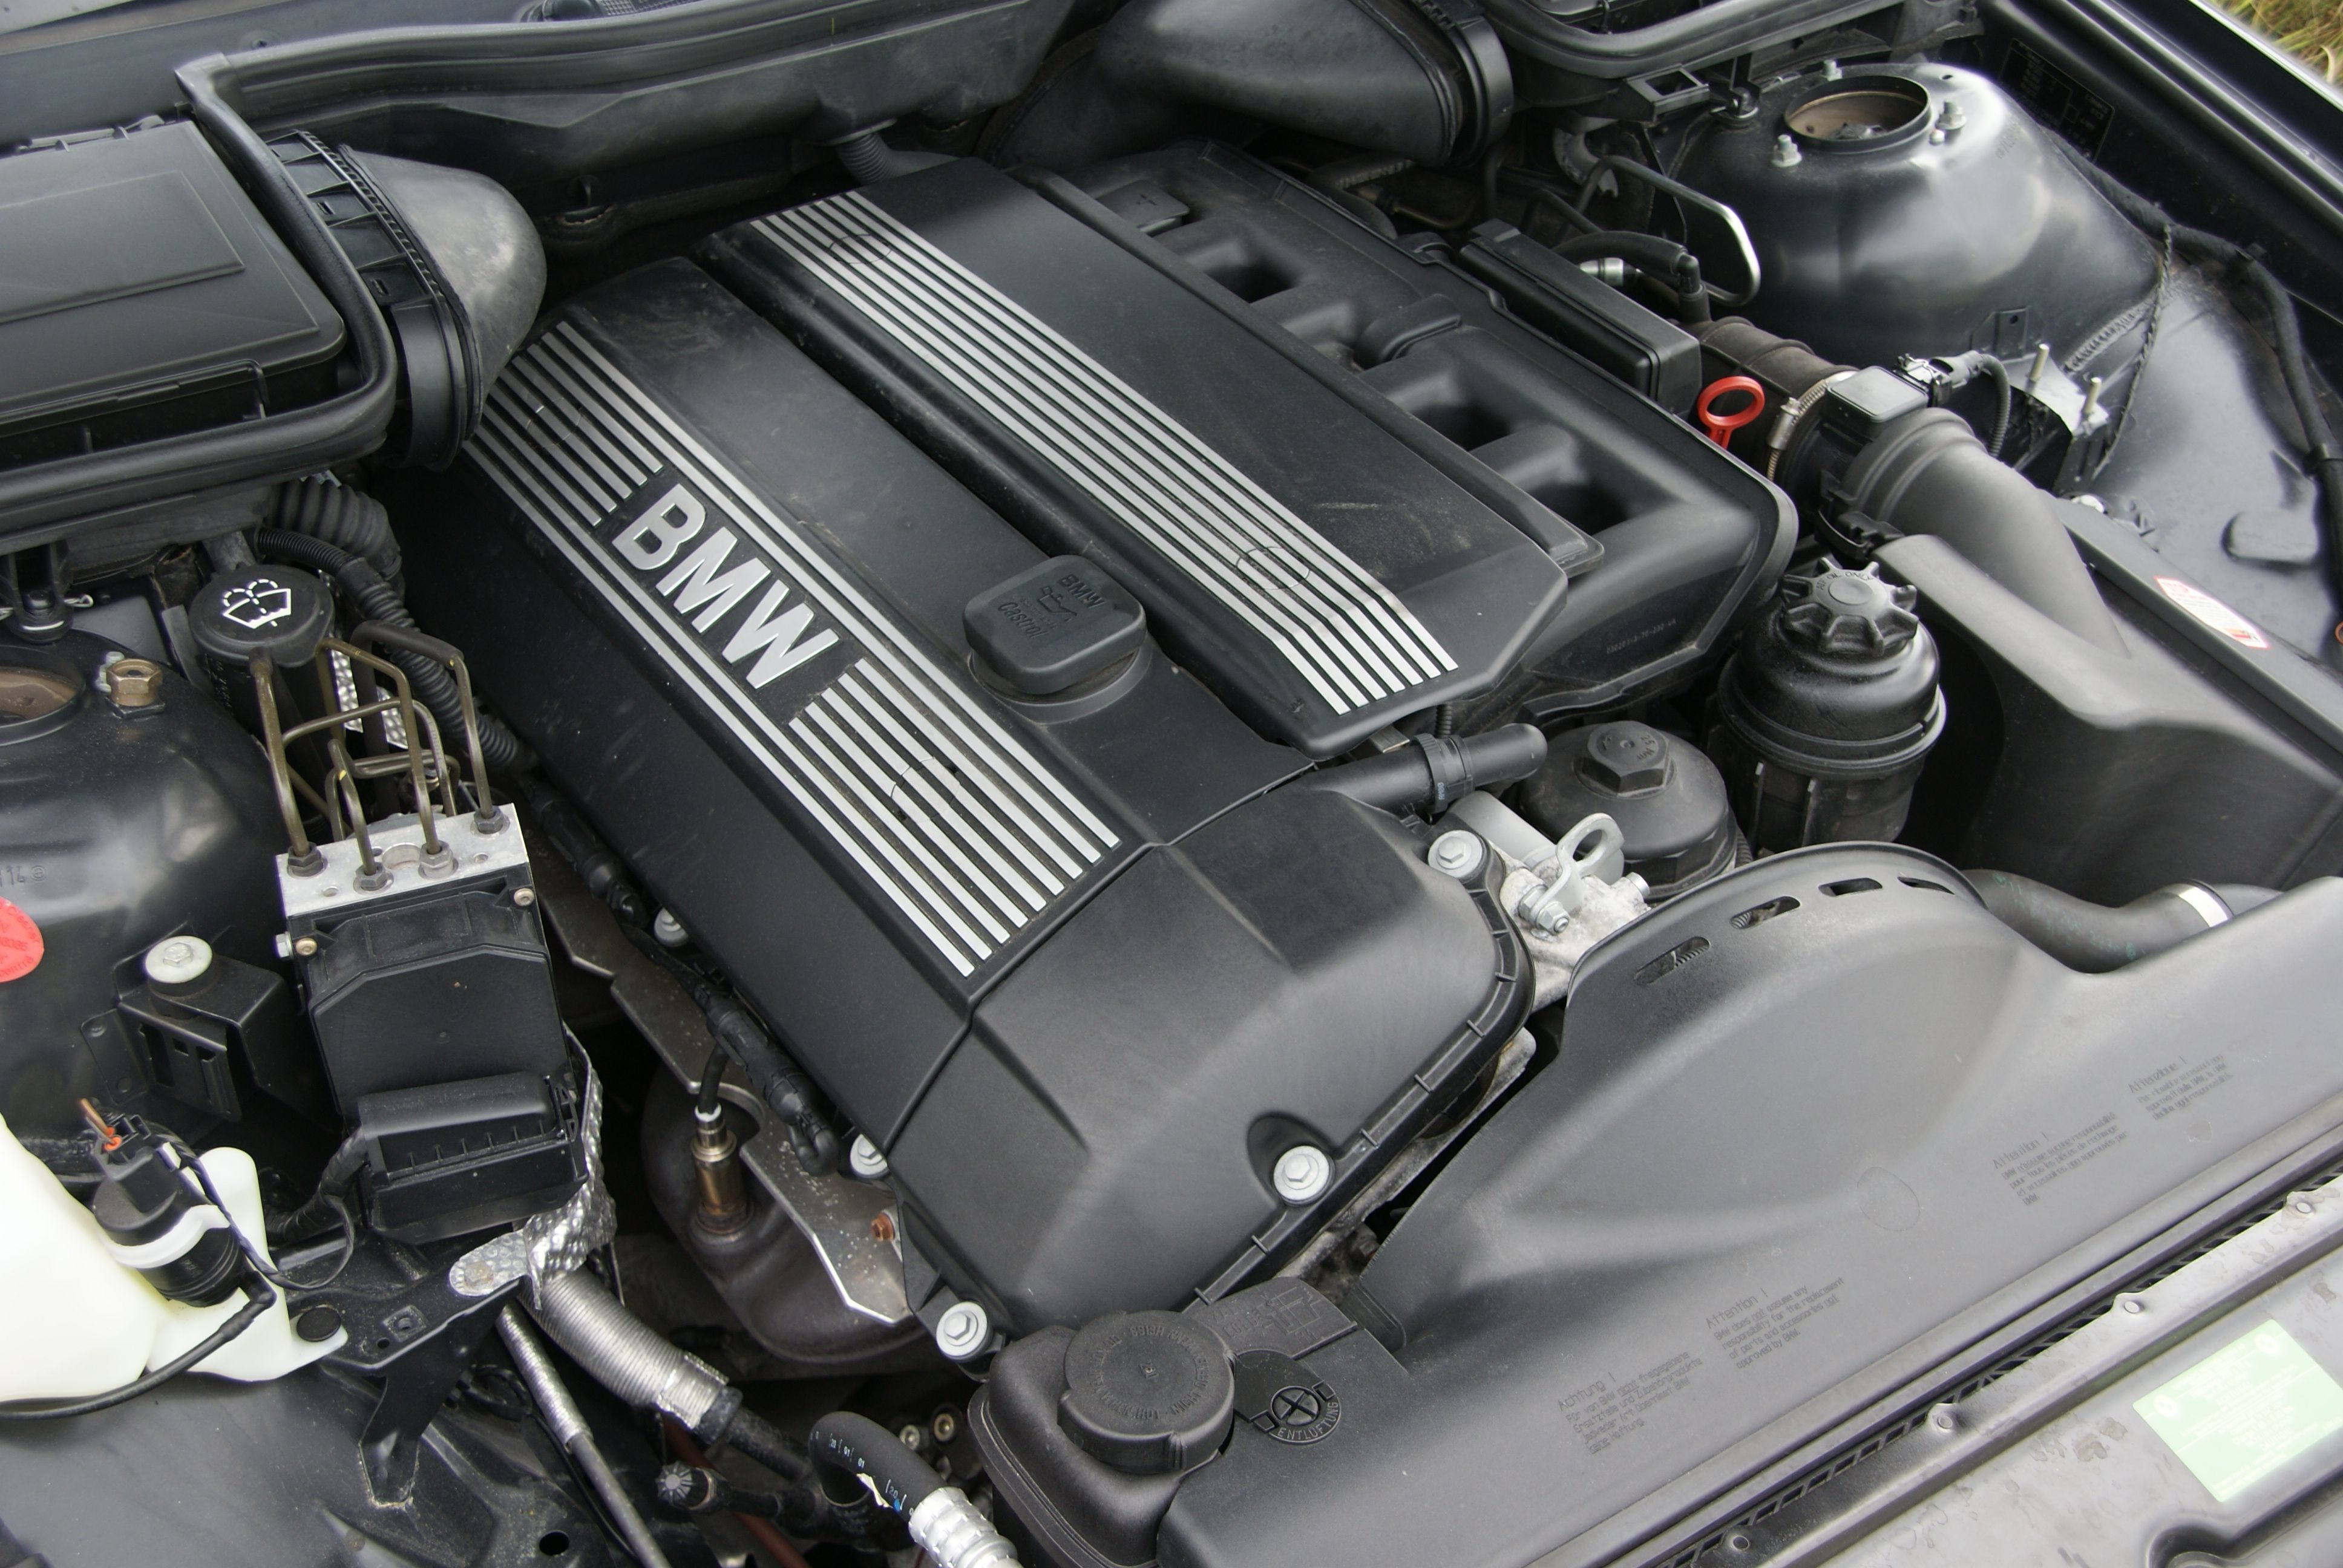 Pin By Usedpartx On Bmw Used Engine Bmw M54 Bmw Engines Bmw